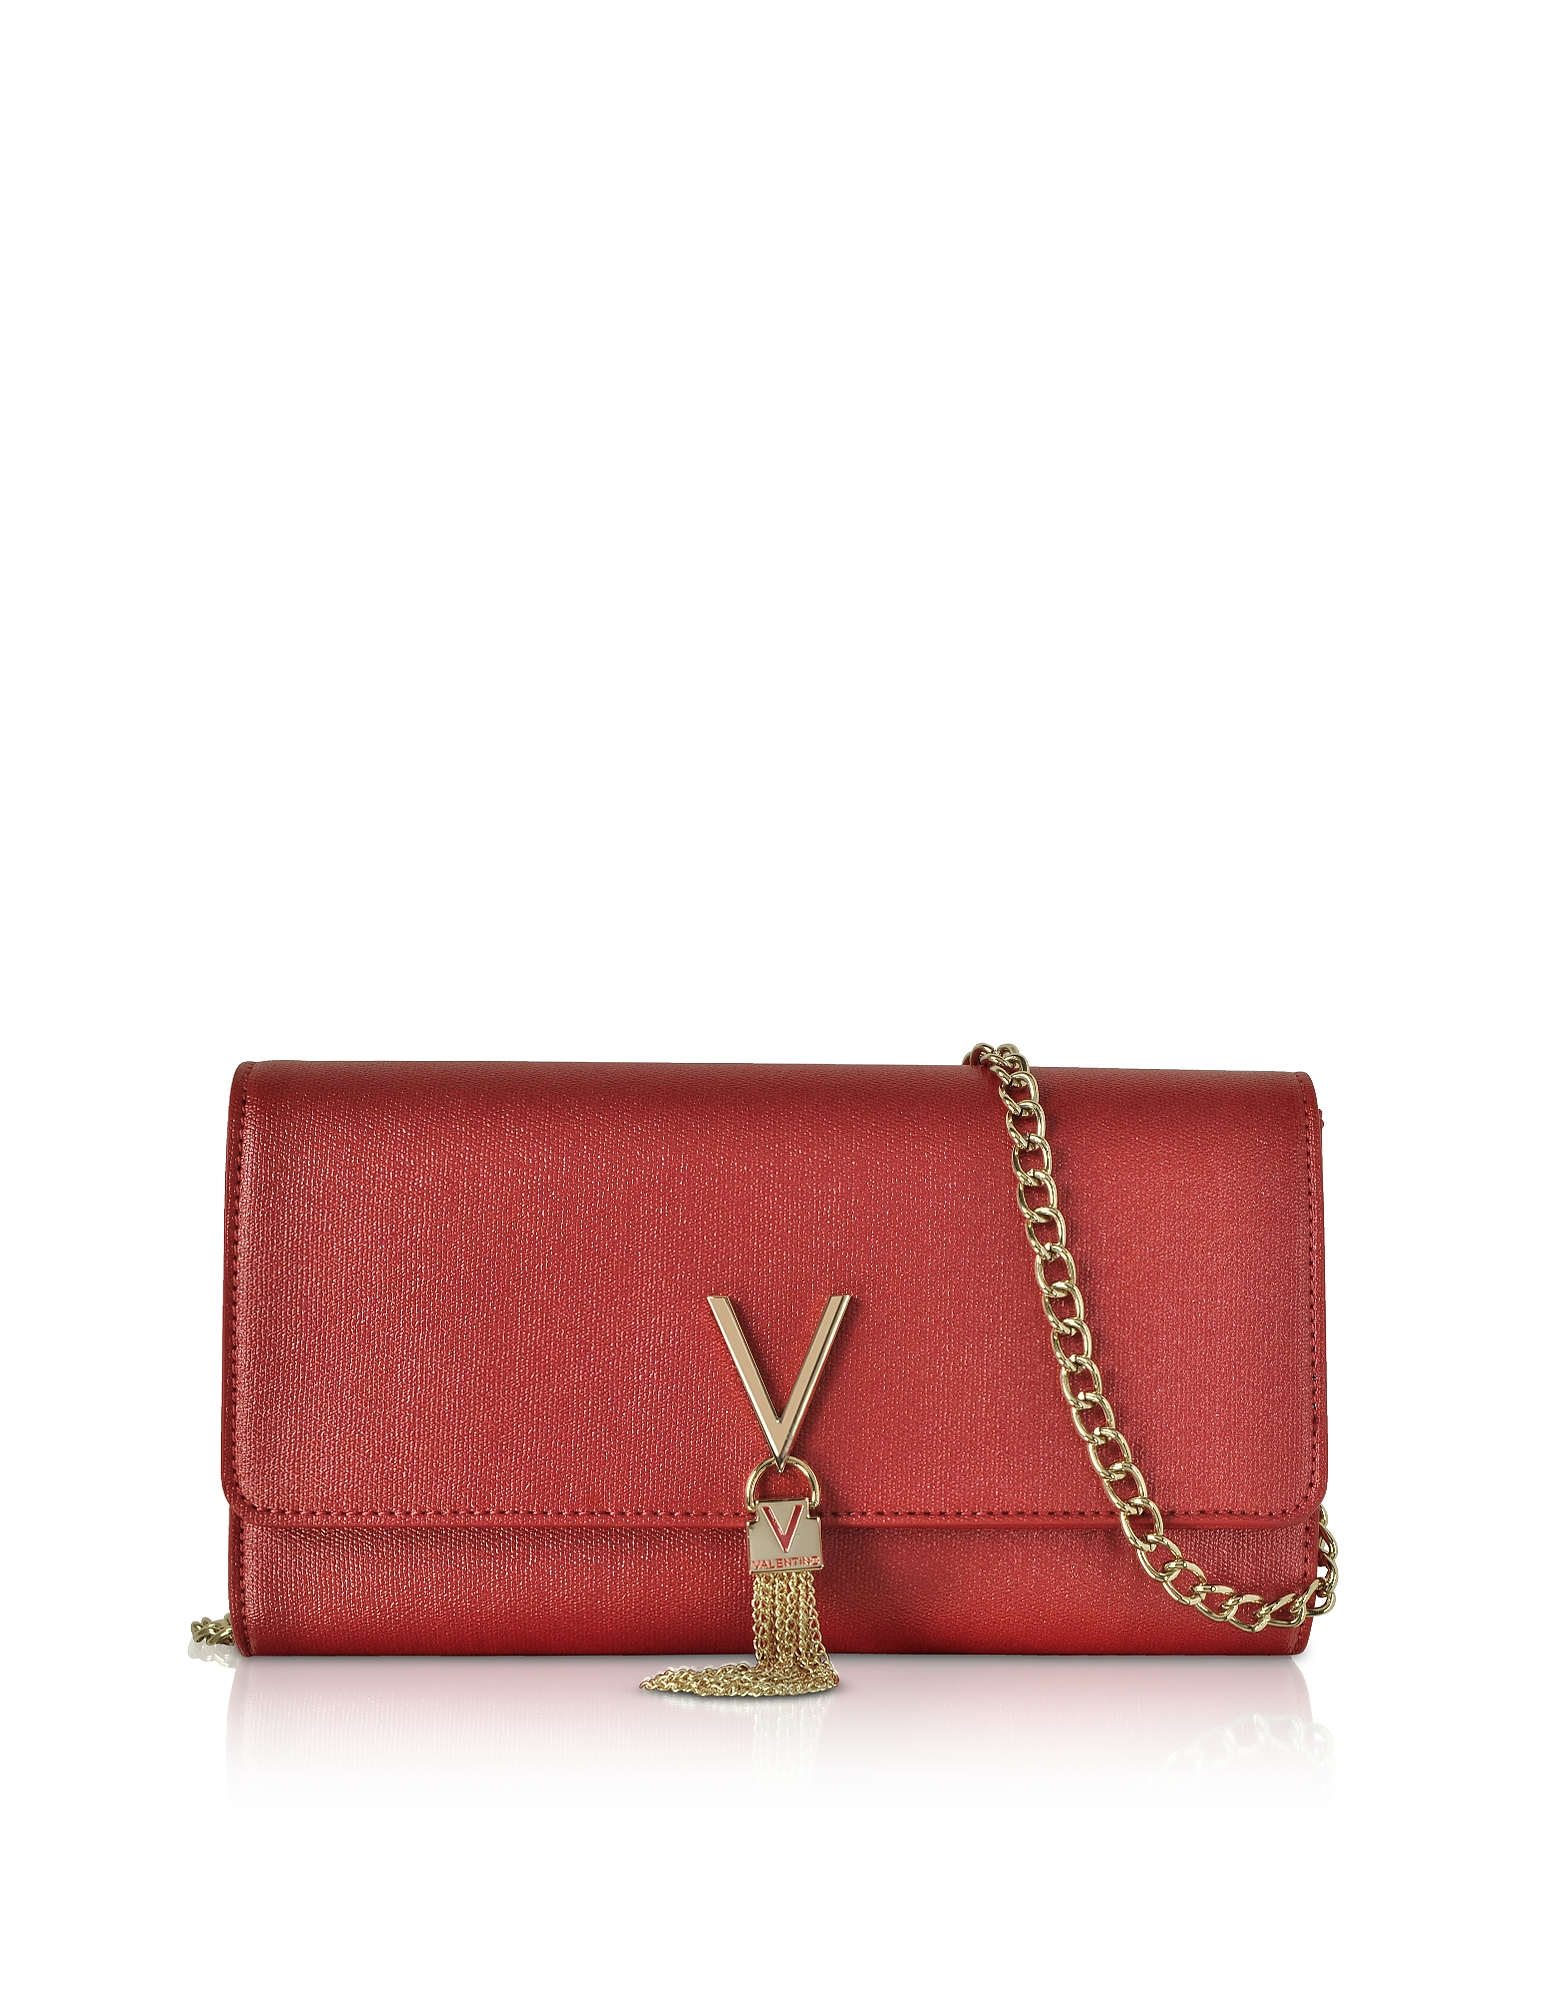 Valentino by Mario Valentino Handbags, Eco Grained Leather Marilyn Shoulder Bag